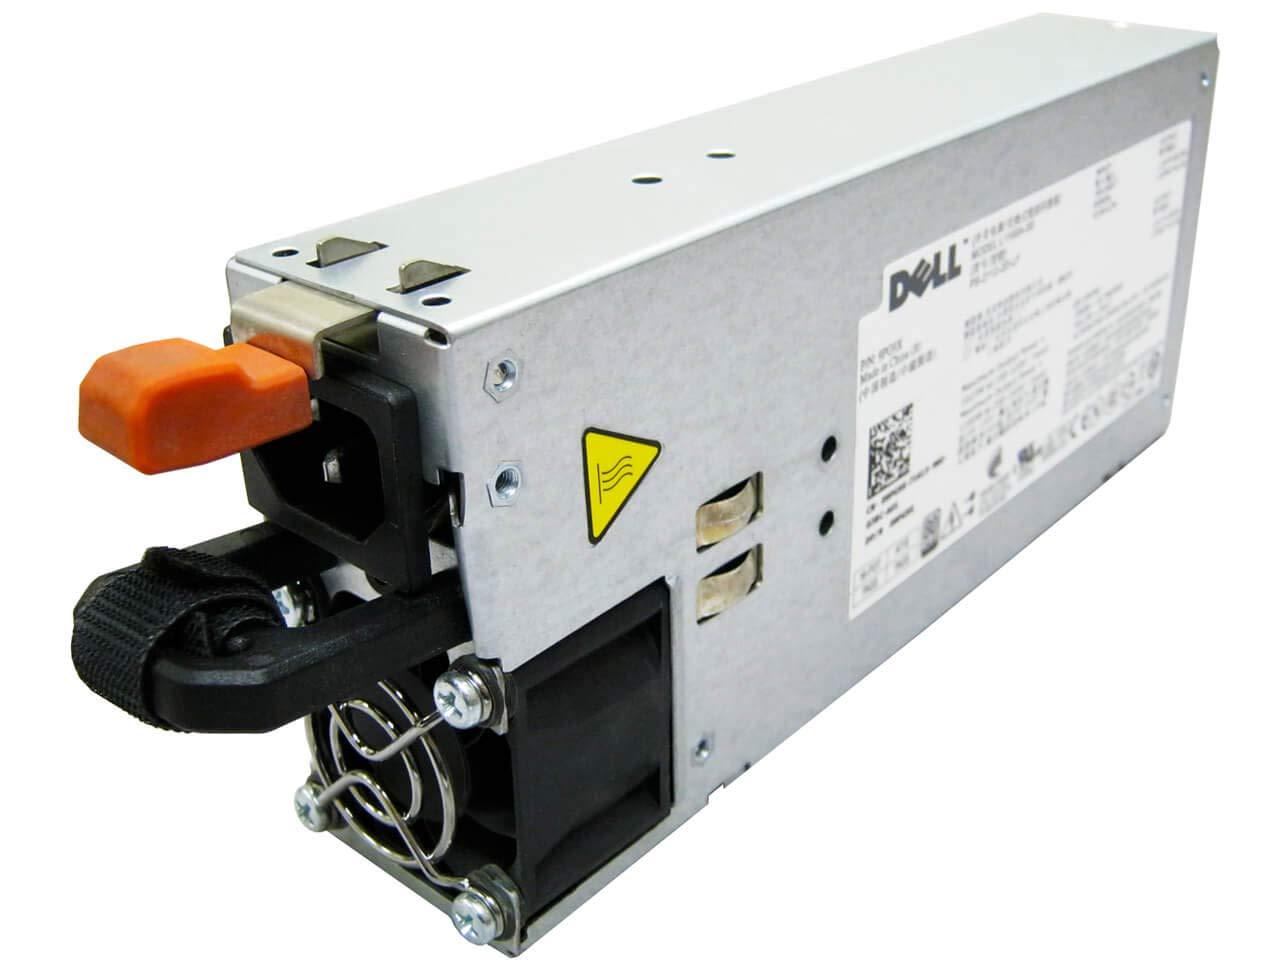 Dell 1100W Redundant Power Supply for PowerEdge T710 Server PN: TCVRR GVHPX 3MJJP F6V5T 9PG9X 1Y45R Y613G